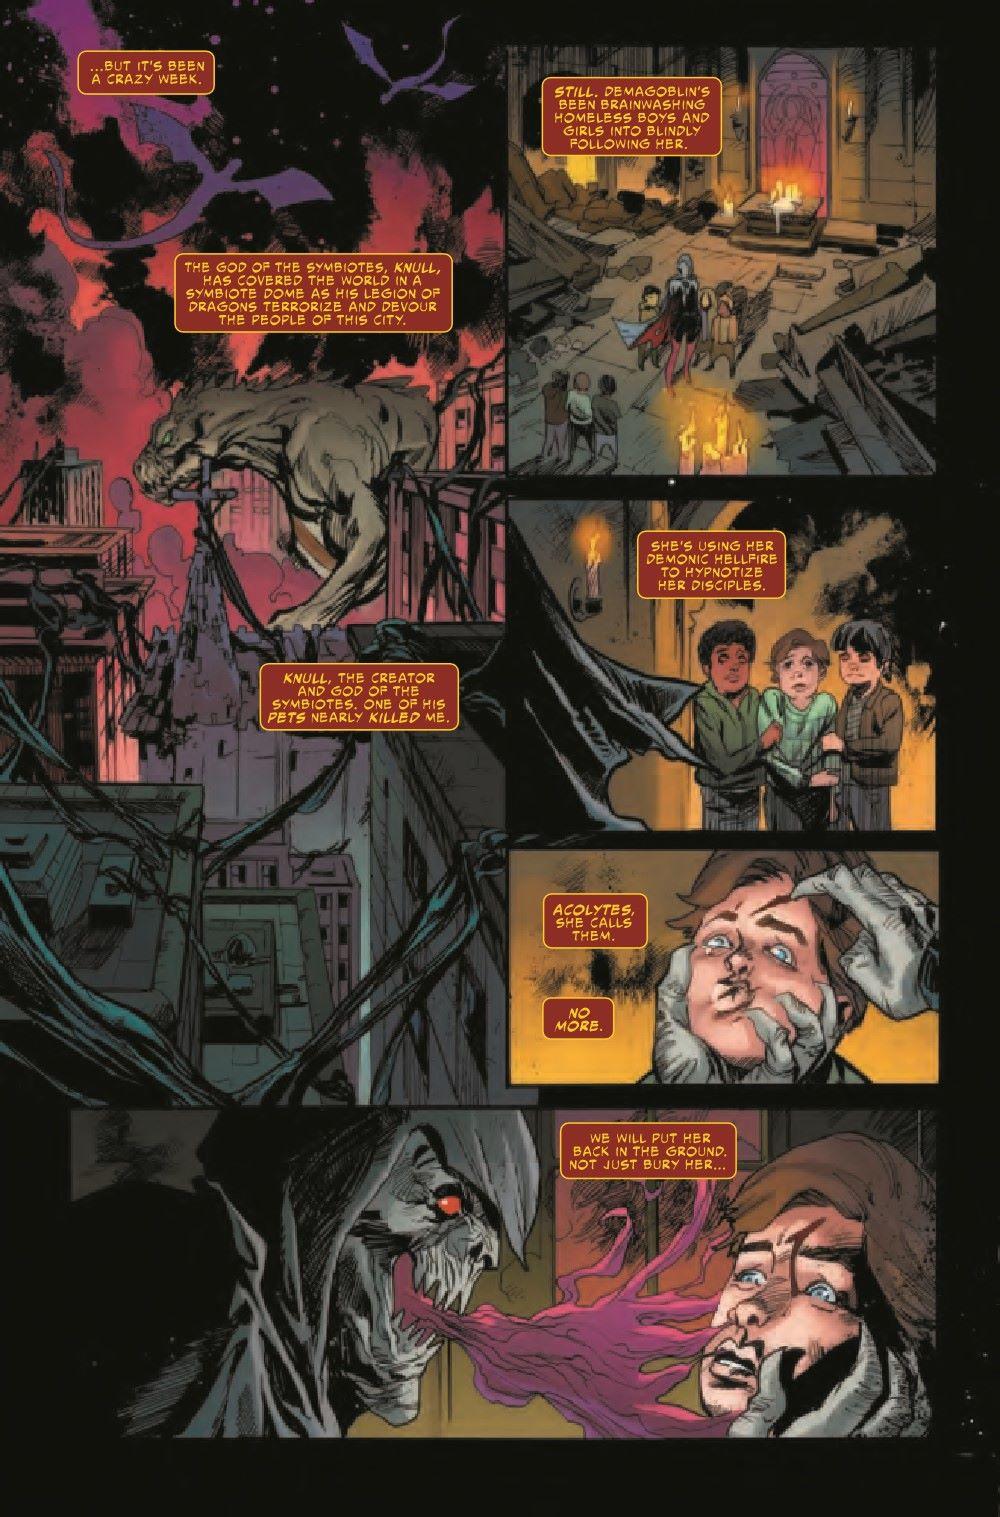 SCREAMKIB2021001_Preview-4 ComicList Previews: KING IN BLACK SCREAM #1